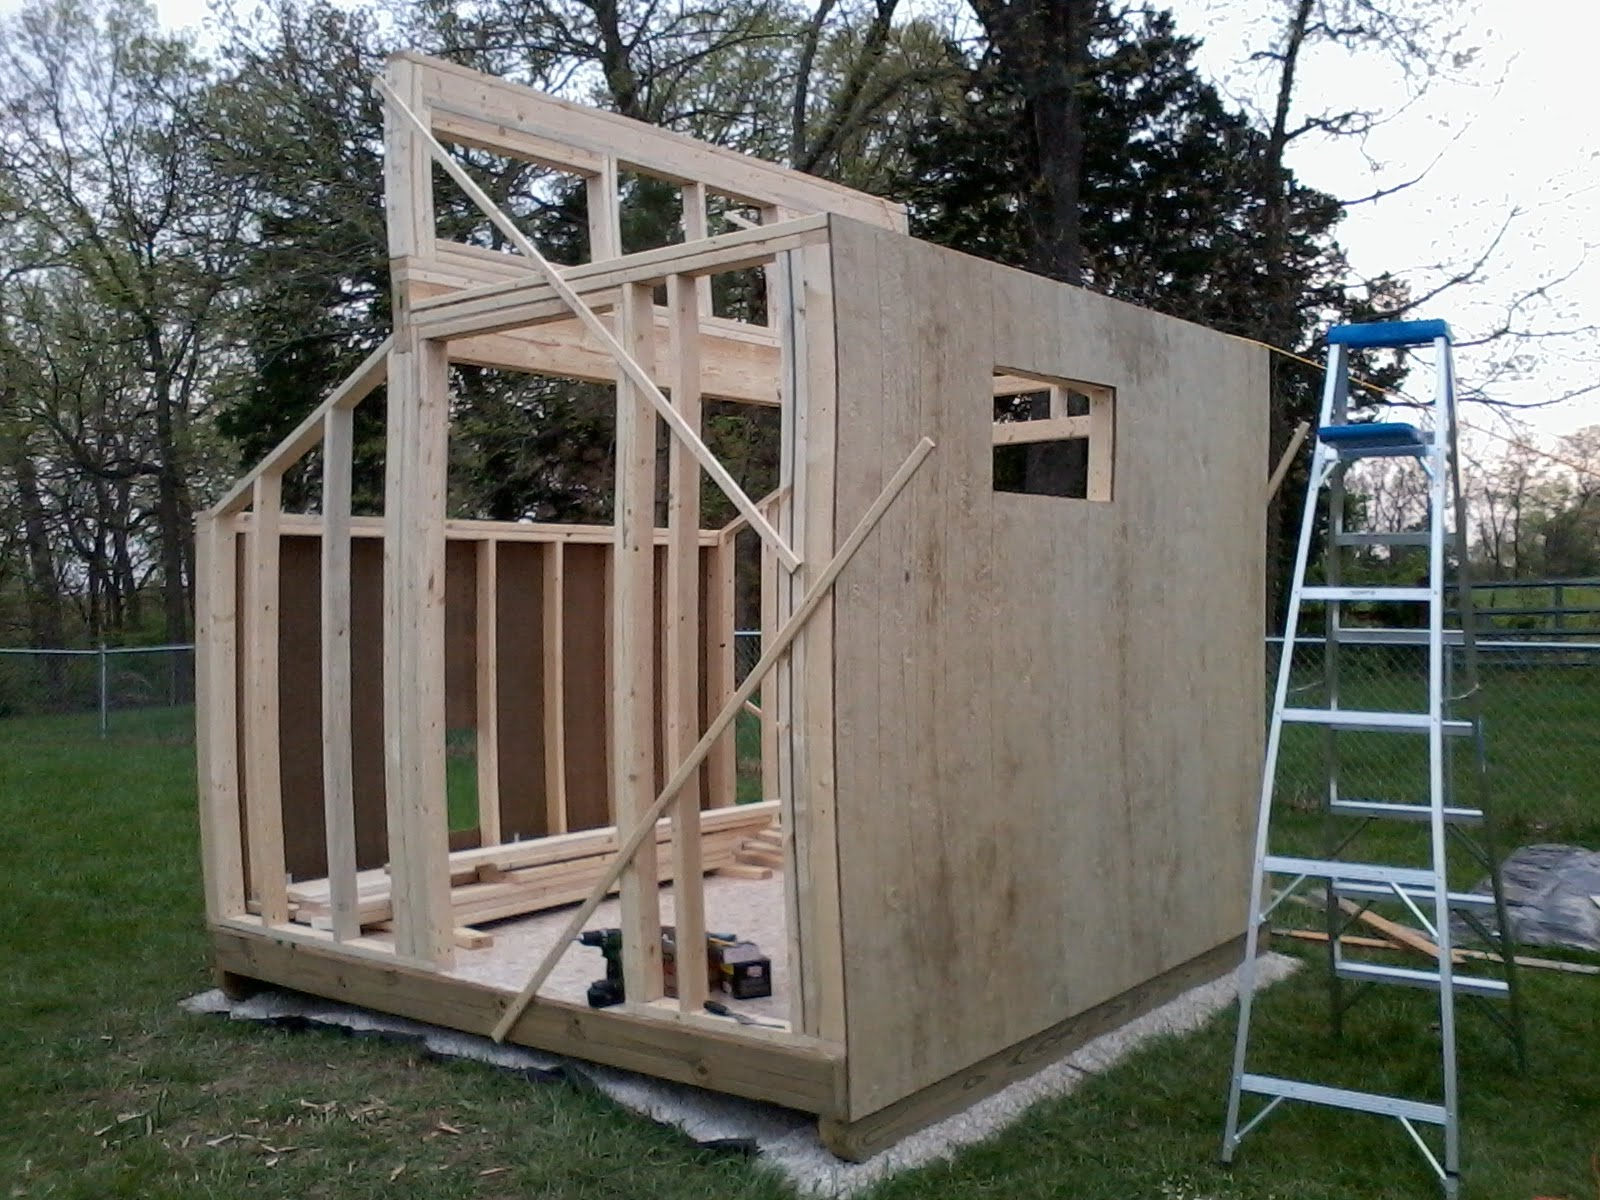 Inspiring Clerestory Shed 18 Photo House Plans 80035